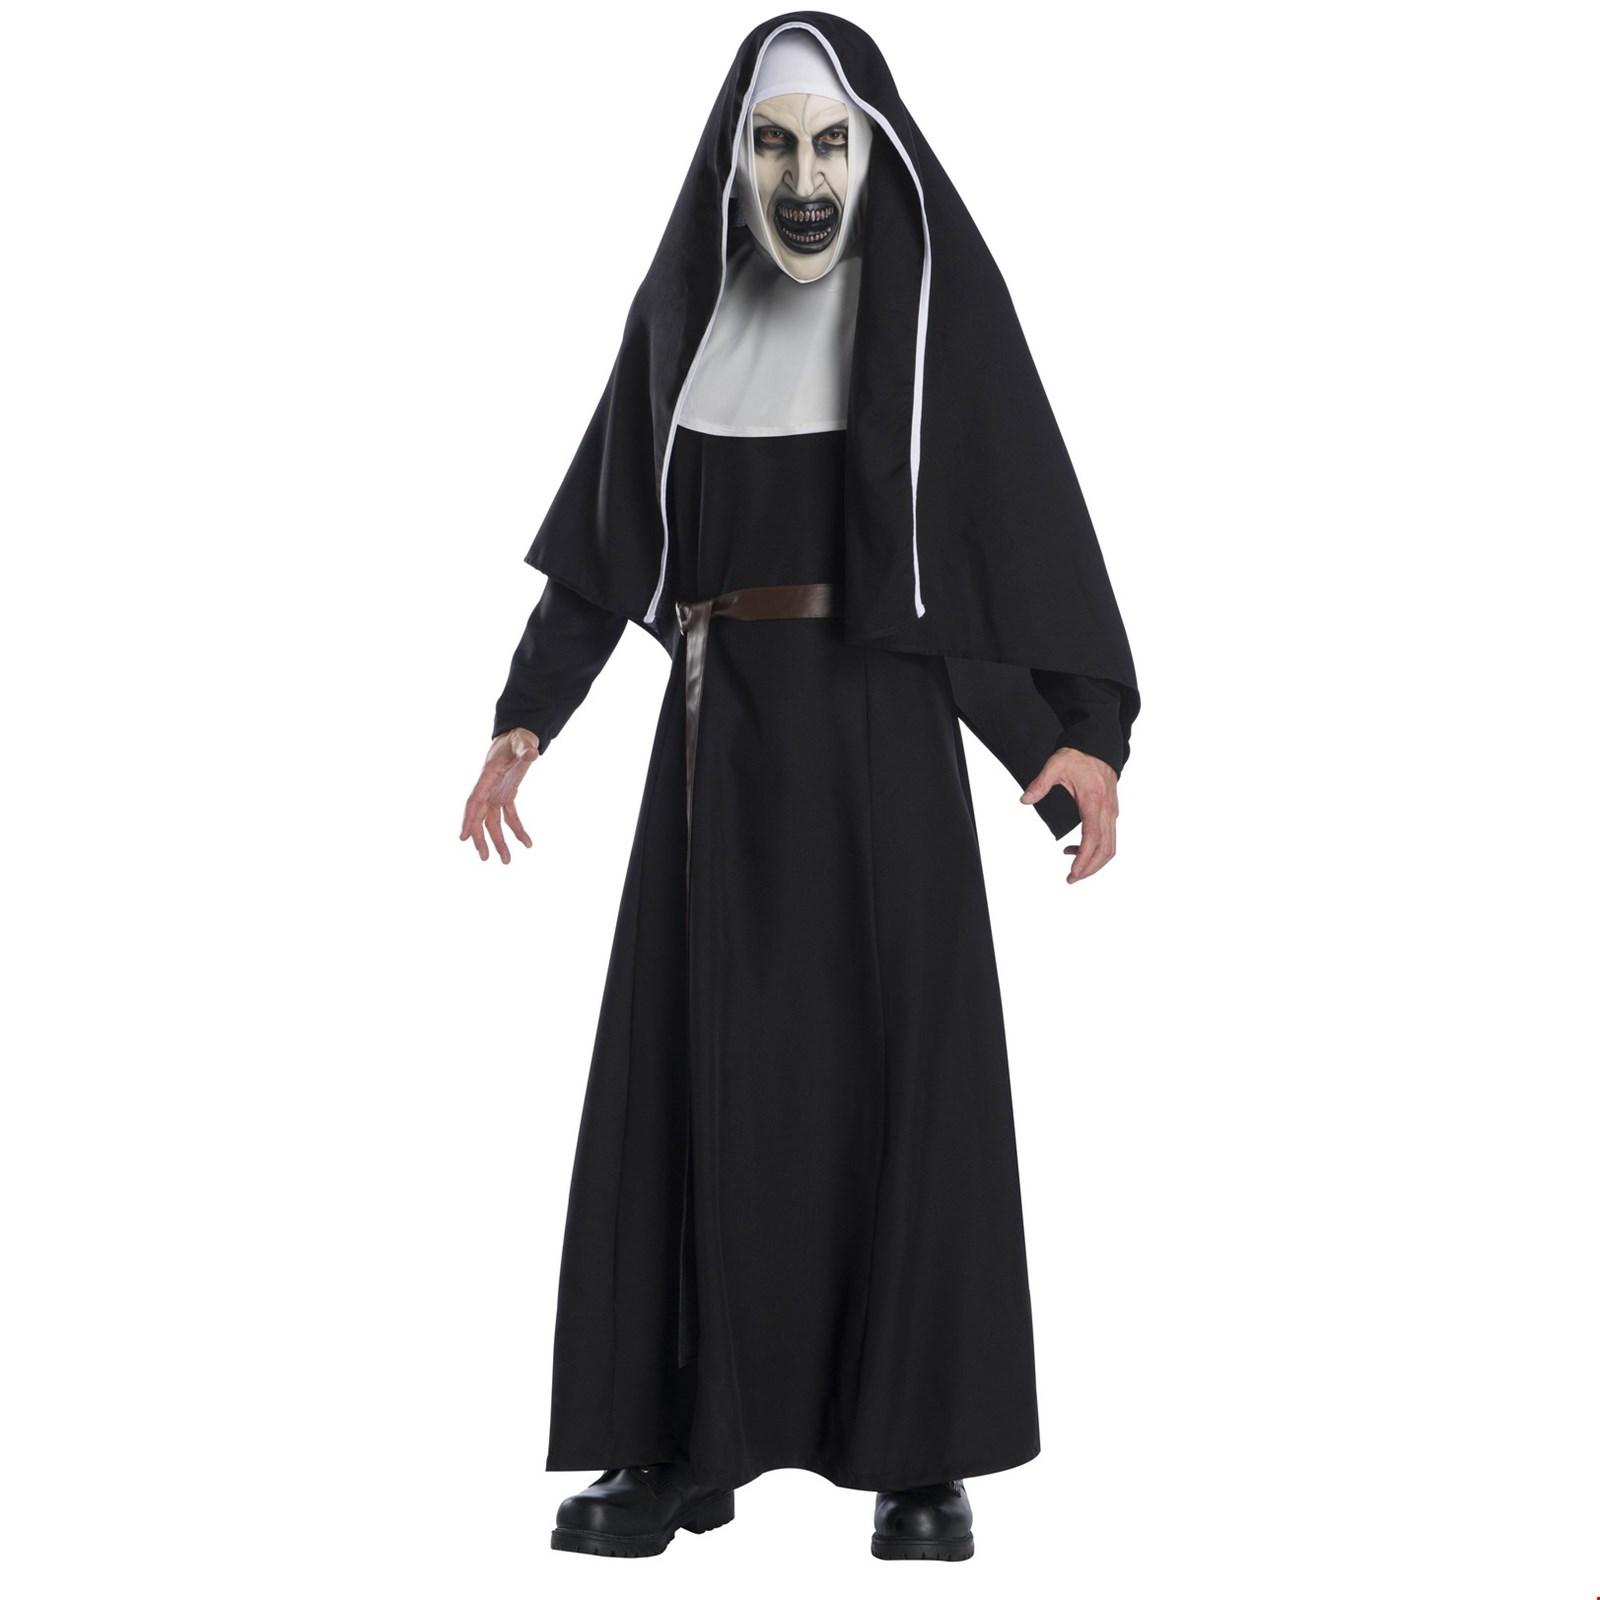 The Nun Movie Deluxe Adult Halloween Costume